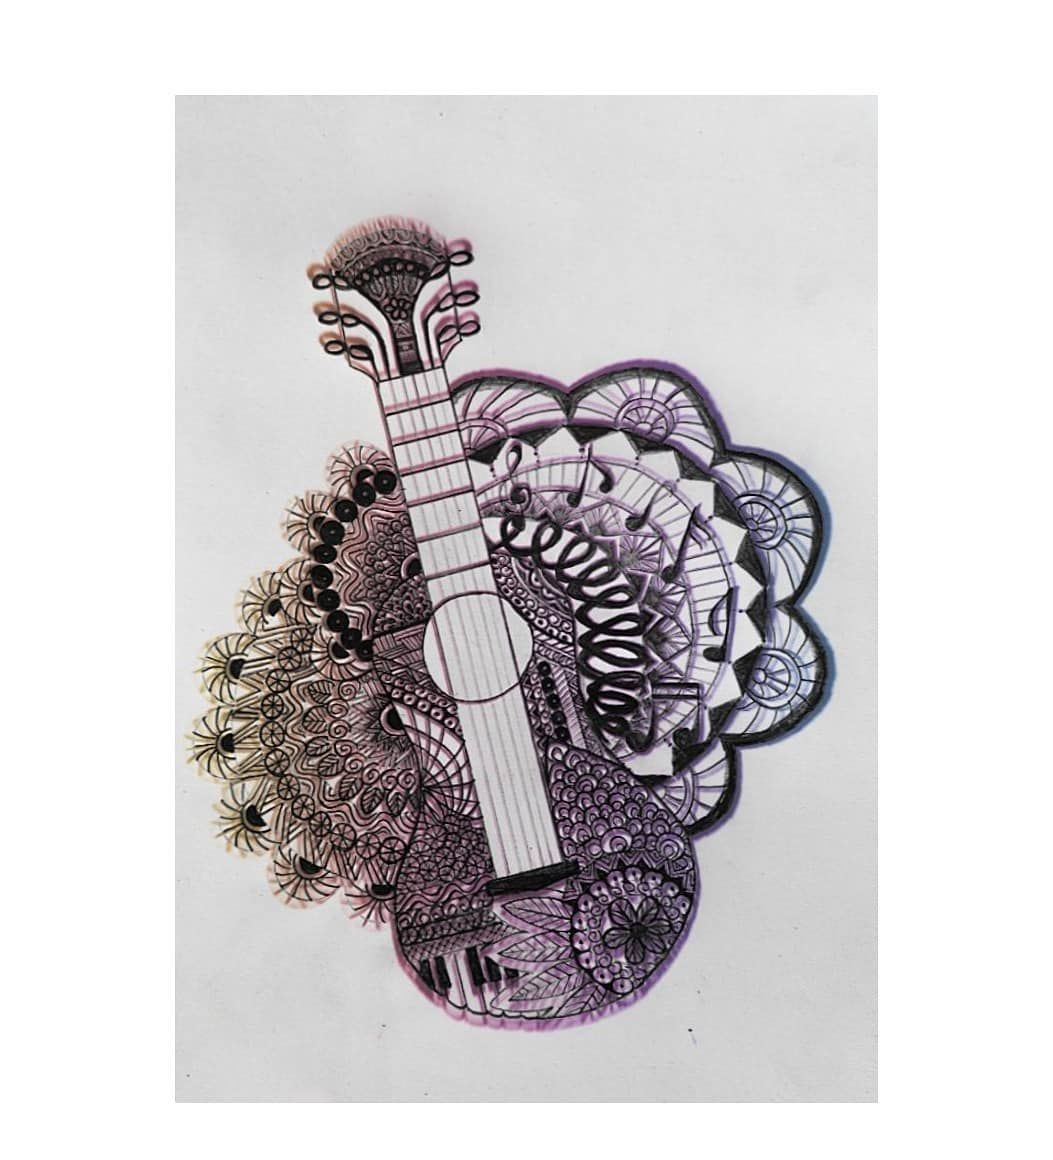 Check out the profile 👈 . @itsmdristi_m . #mandala #art #mandalas #mandalaart #tattoo #mandalatattoo #artist #drawing #artwork #handmade #zentangle #dotwork #ink #love #tattoos #mandalaartist #sacredgeometry #artistsoninstagram #sharing #mandalalove #mandalapassion #inked #blackwork #meditation #zentangleart #mandaladesign #mandaladrawing #design #dotworktattoo #bhfyp